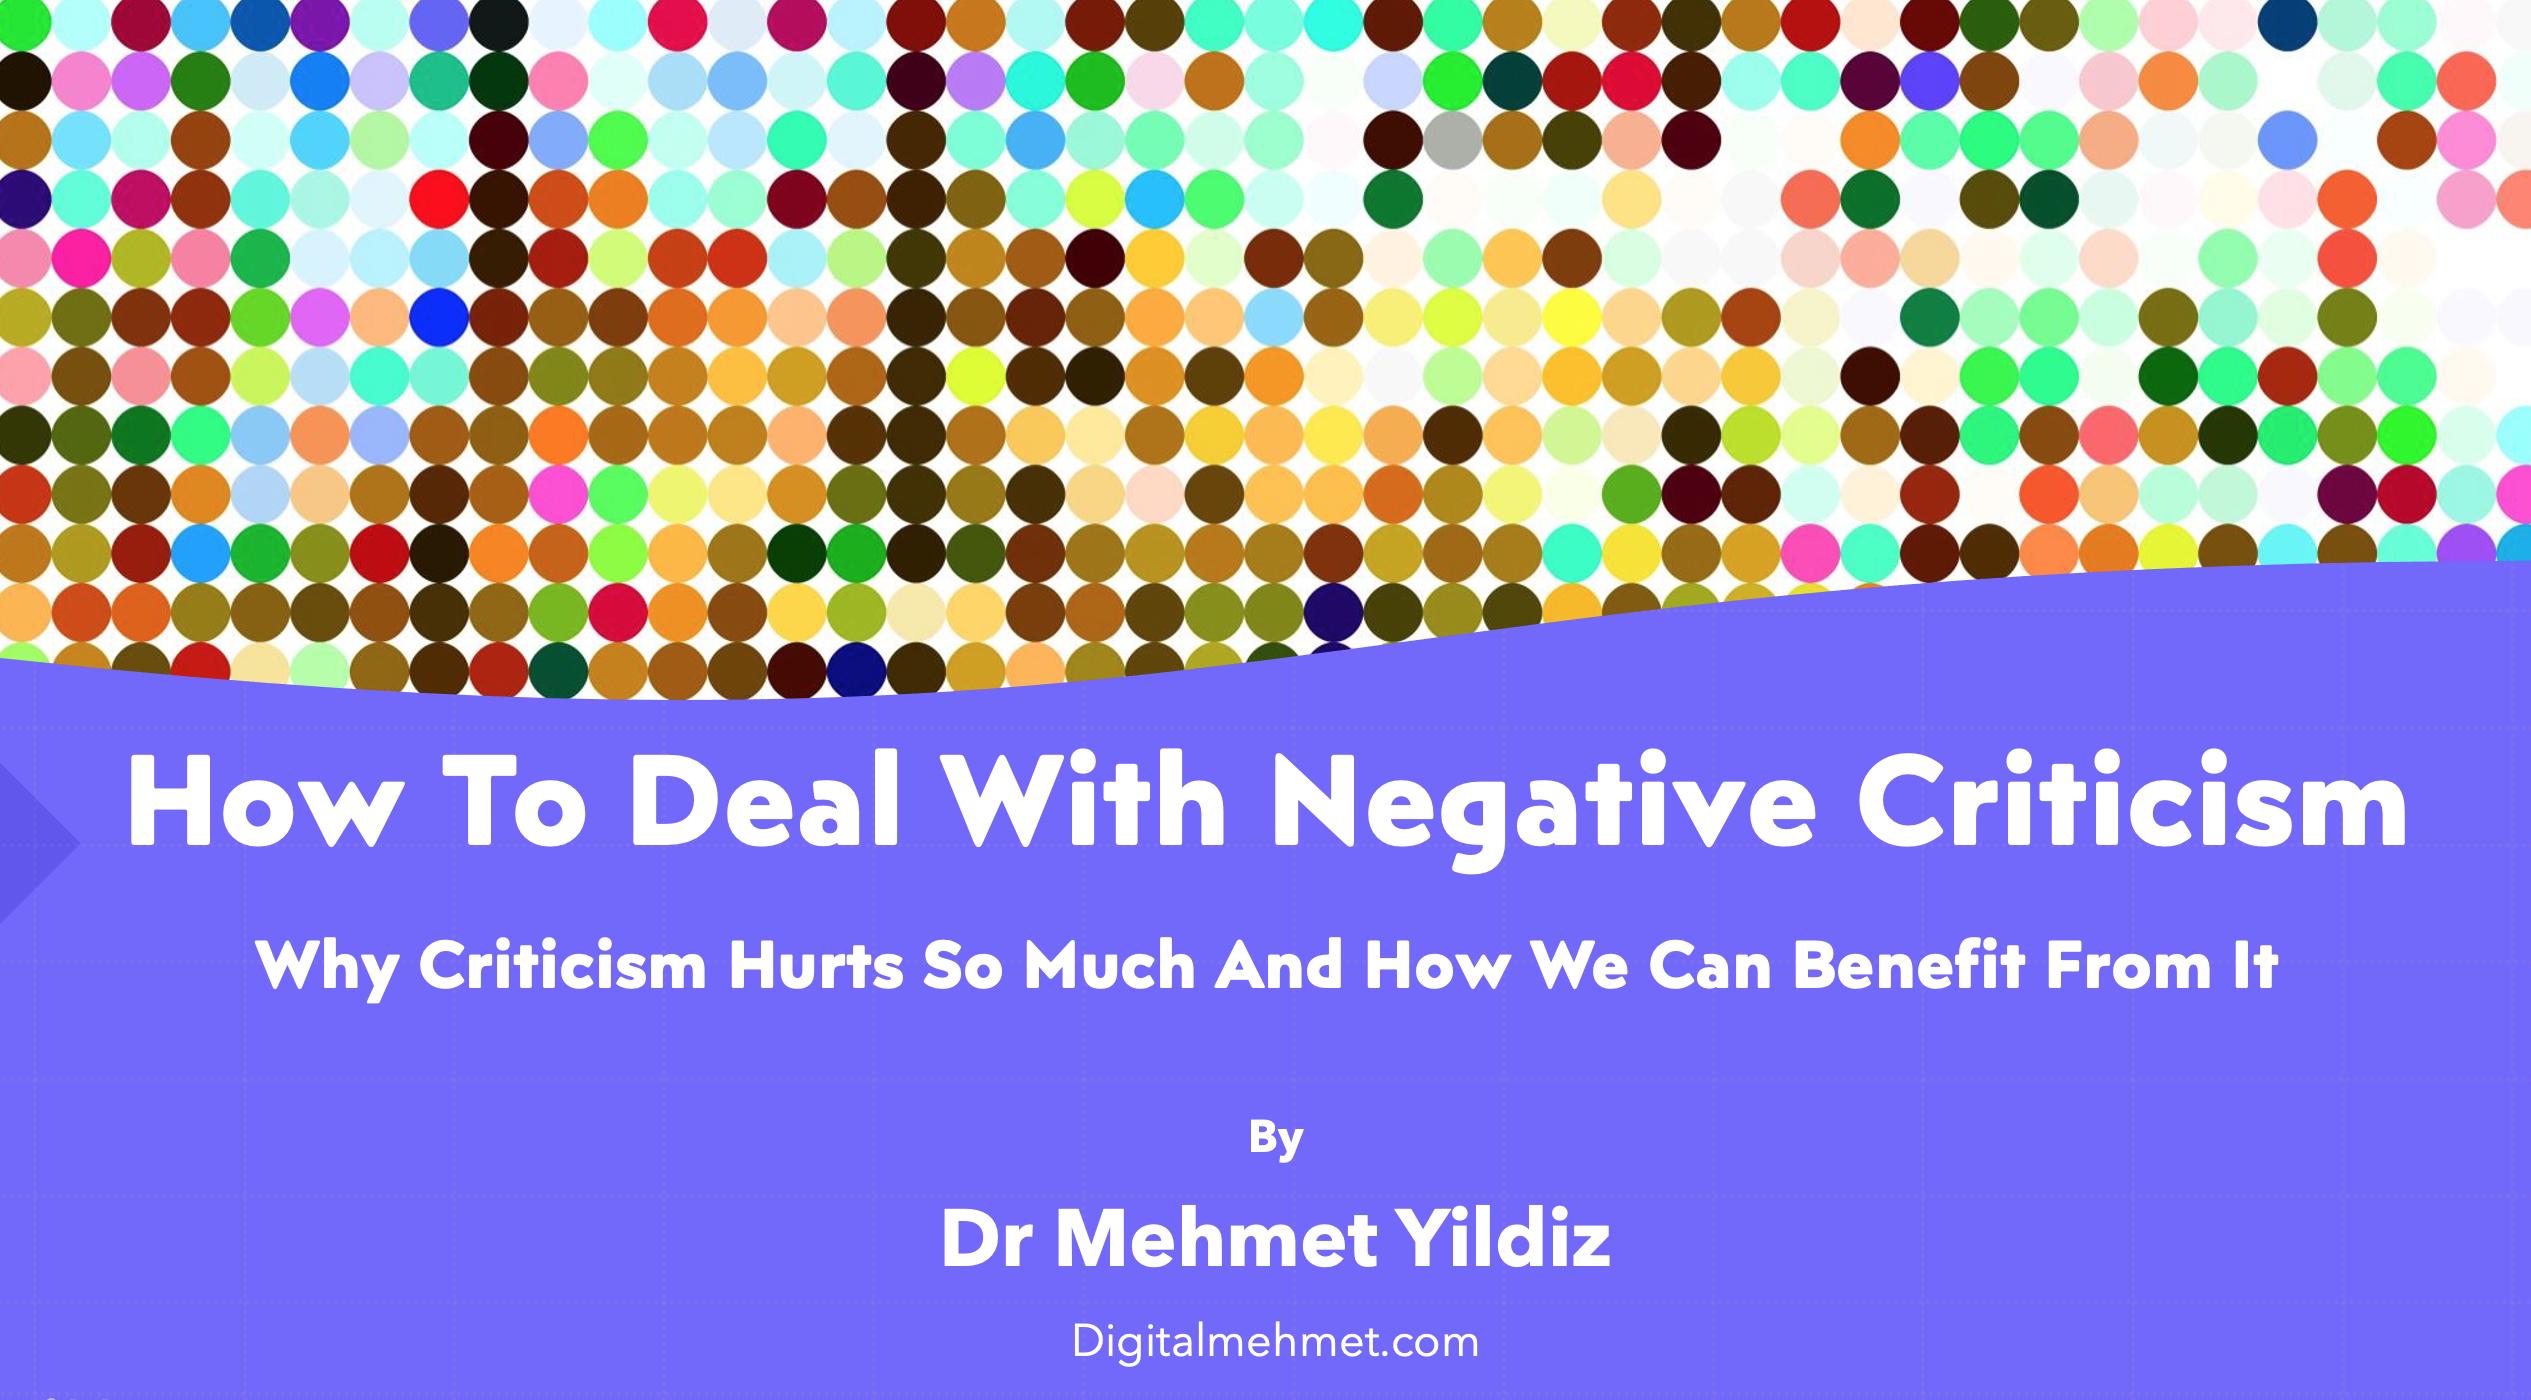 An leadership article by Dr Mehmet Yildiz on Medium—digitalmehmet.com